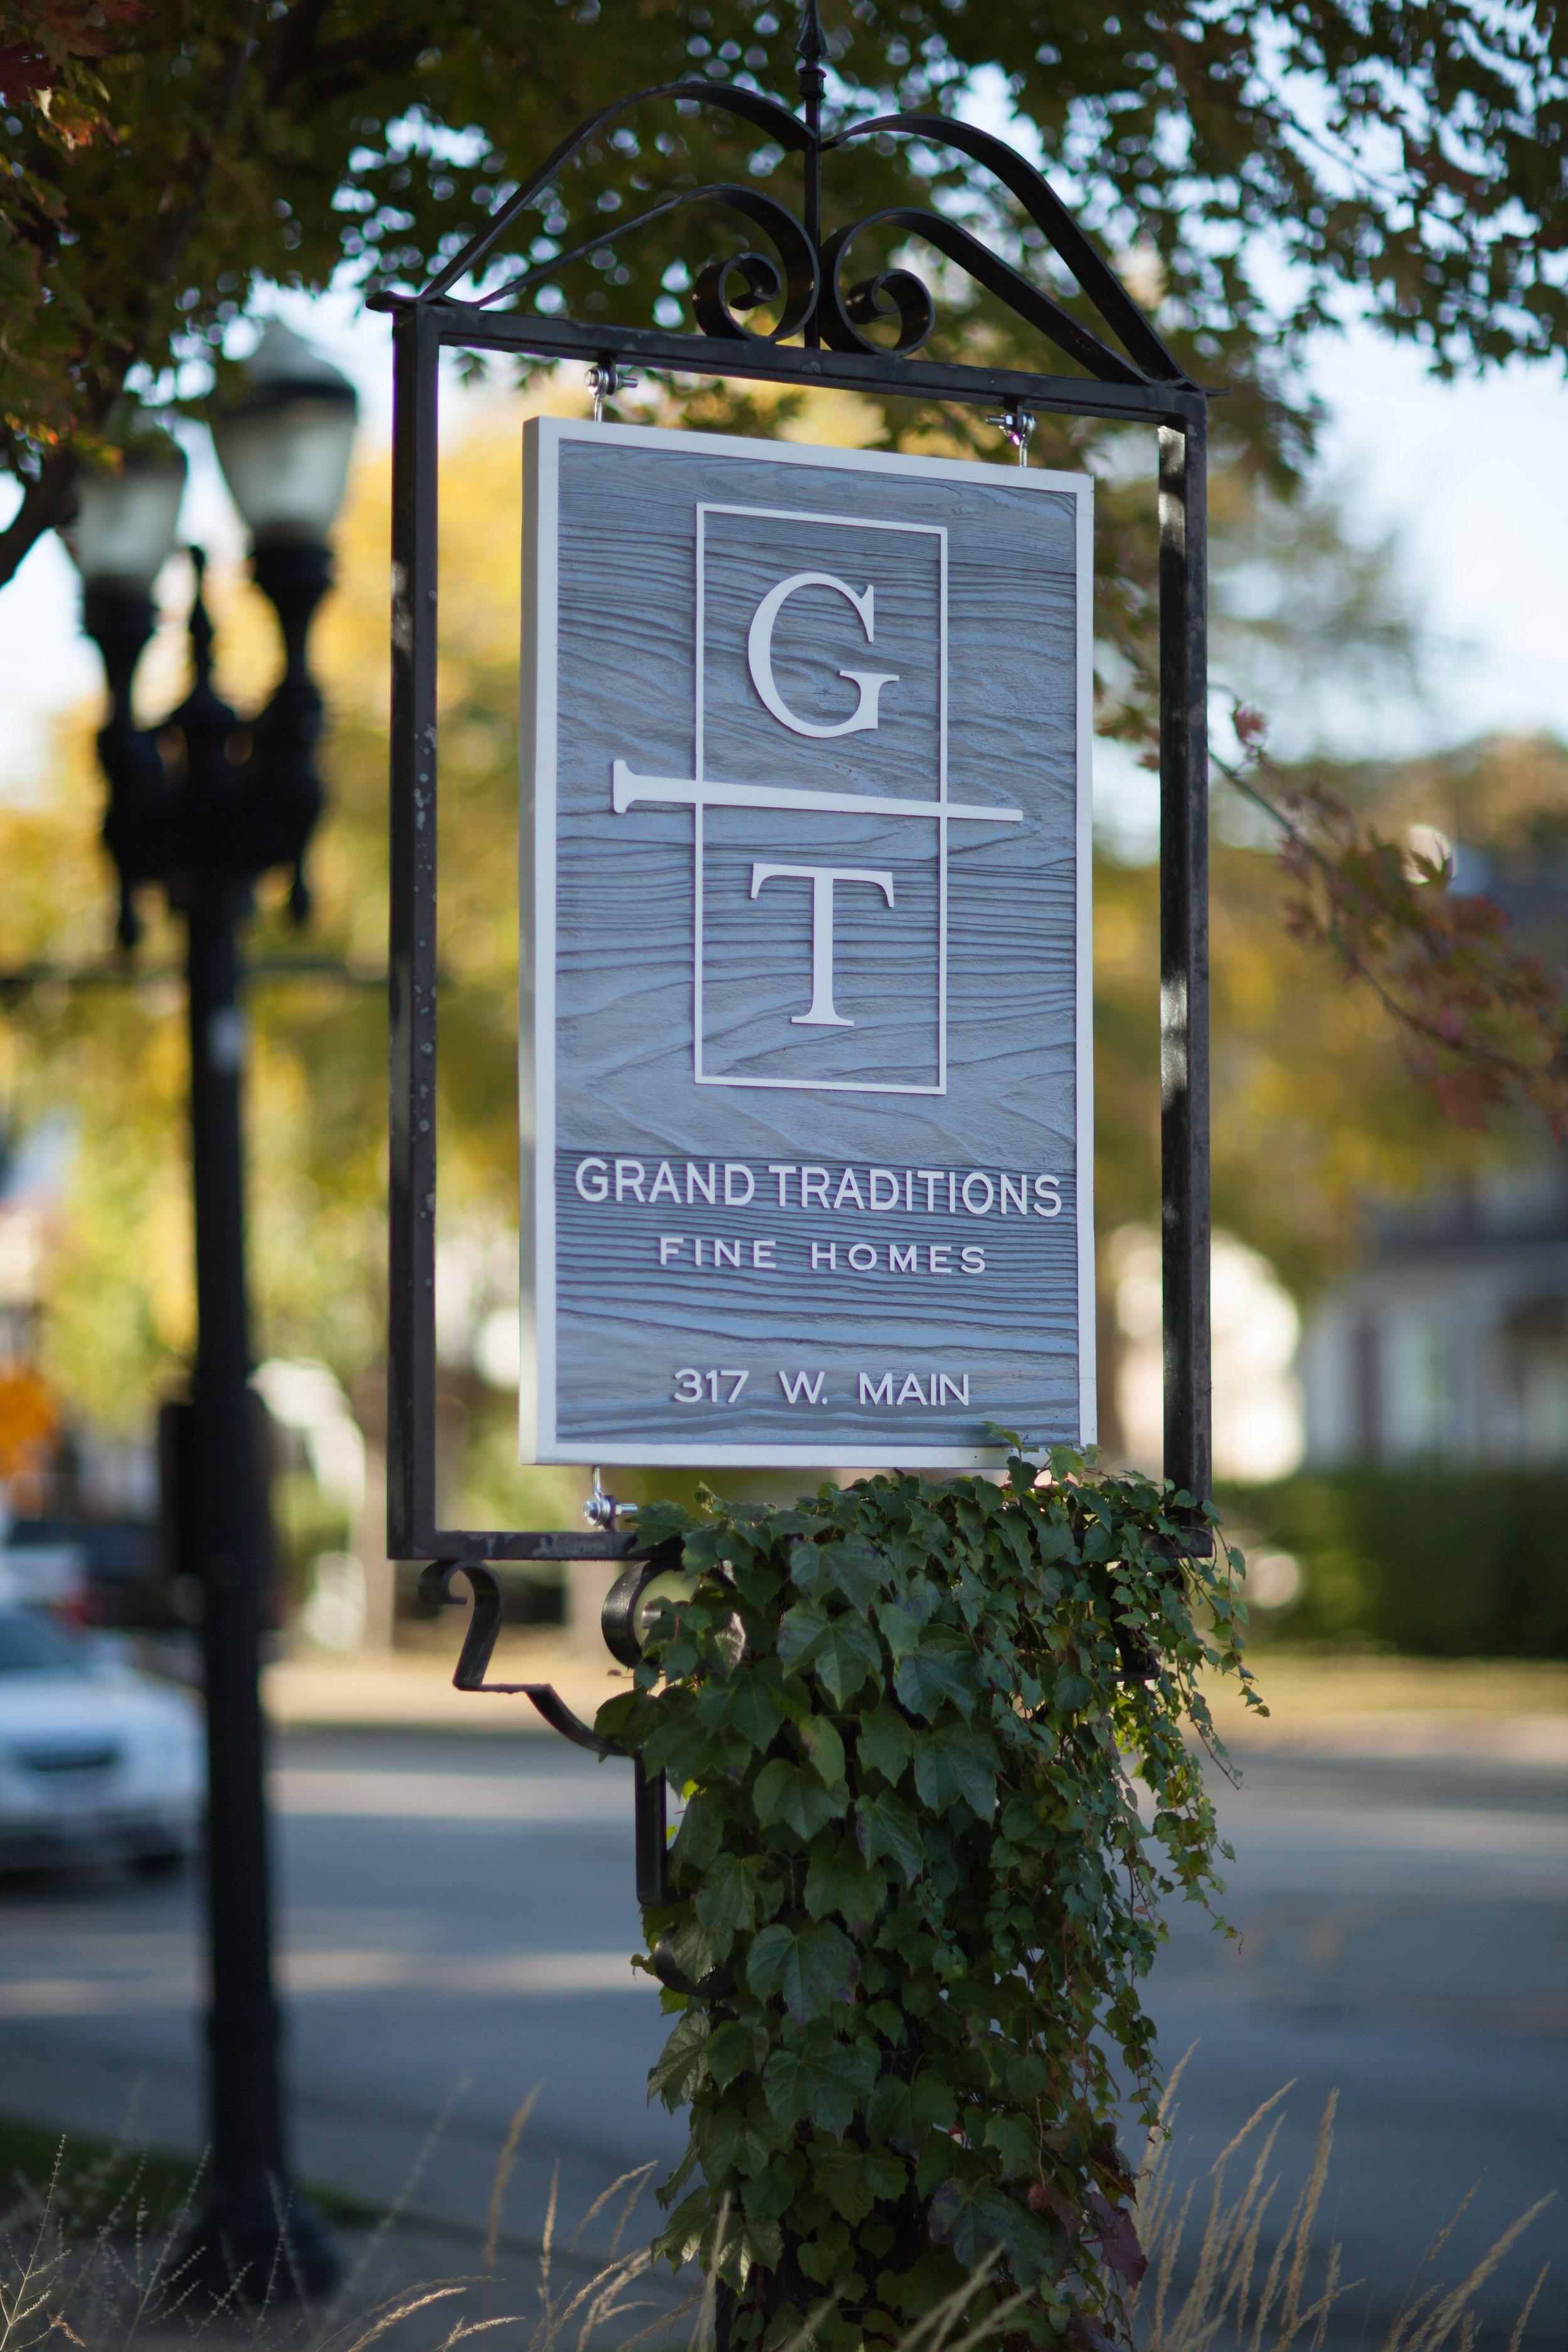 GrandTraditions_Ashby-5-2.jpg